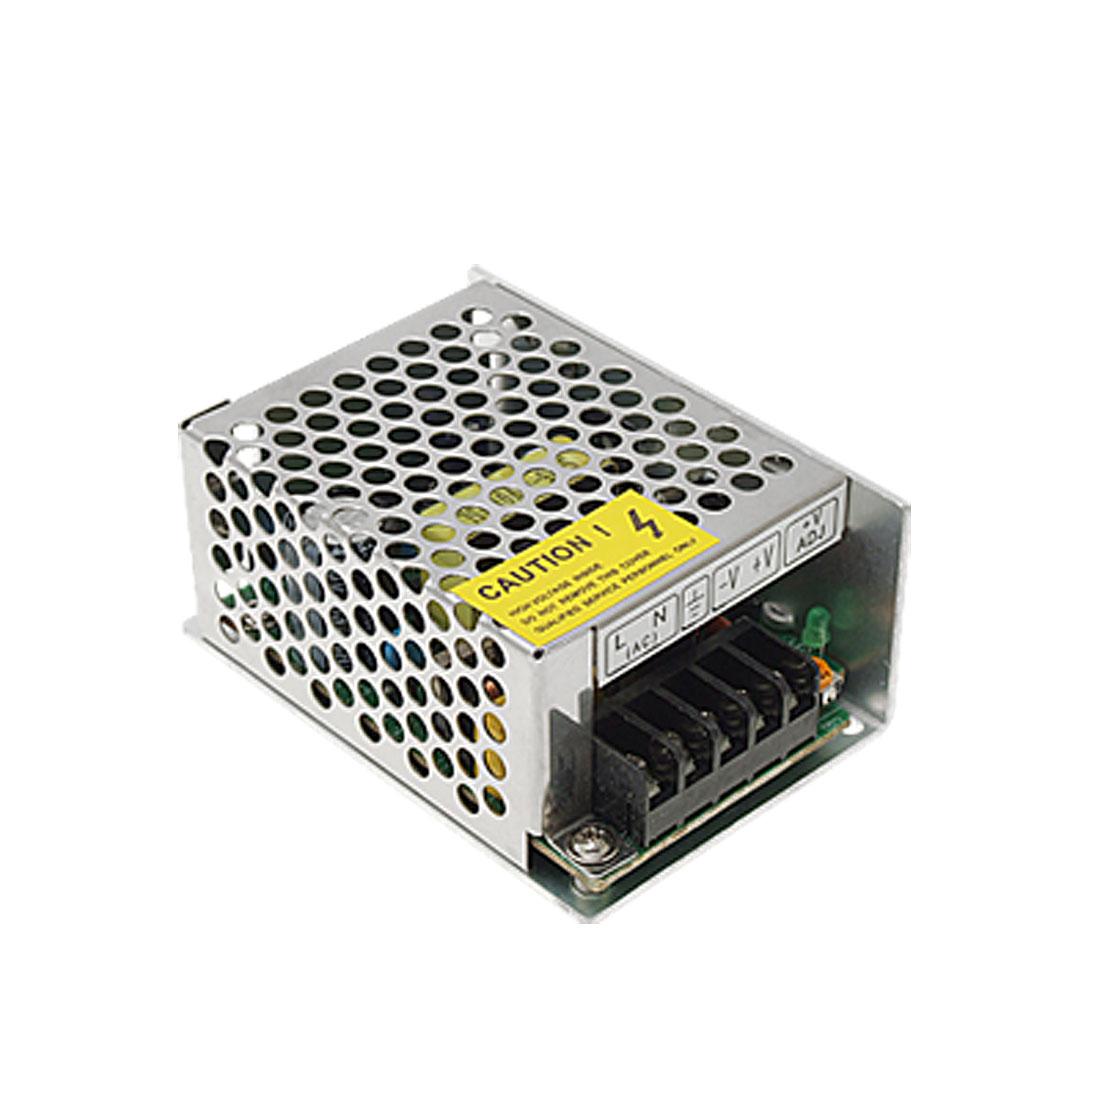 AC 110-220V DC 12V 2A 24W Switch Power Supply Converter Driver for LED Strip Light CCTV